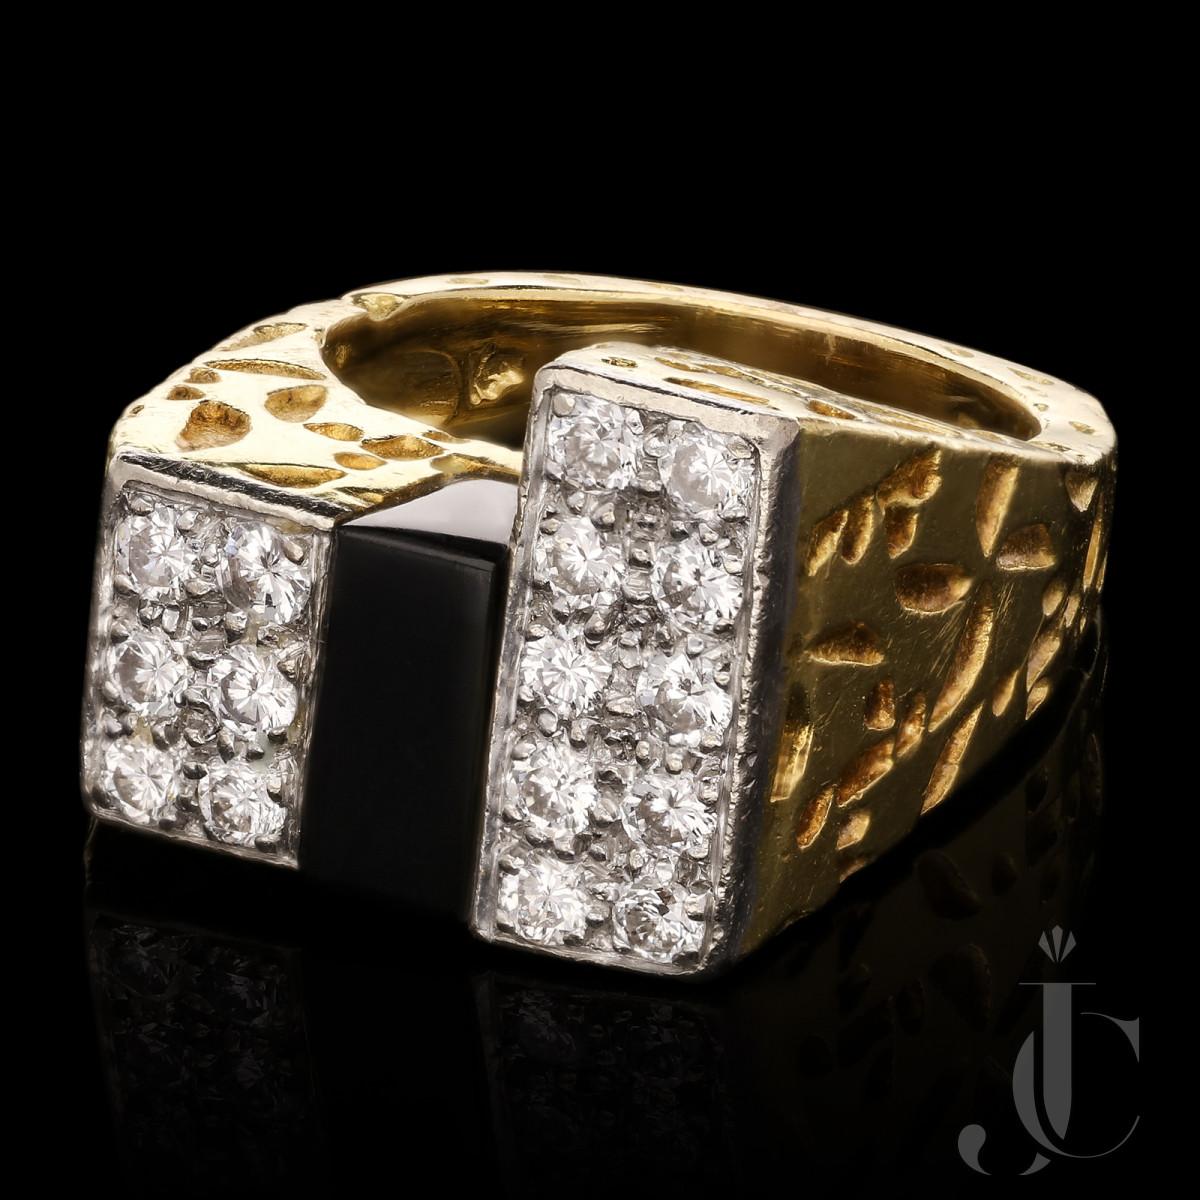 Kutchinsky - Modernist Onyz/Diamond ring 1973